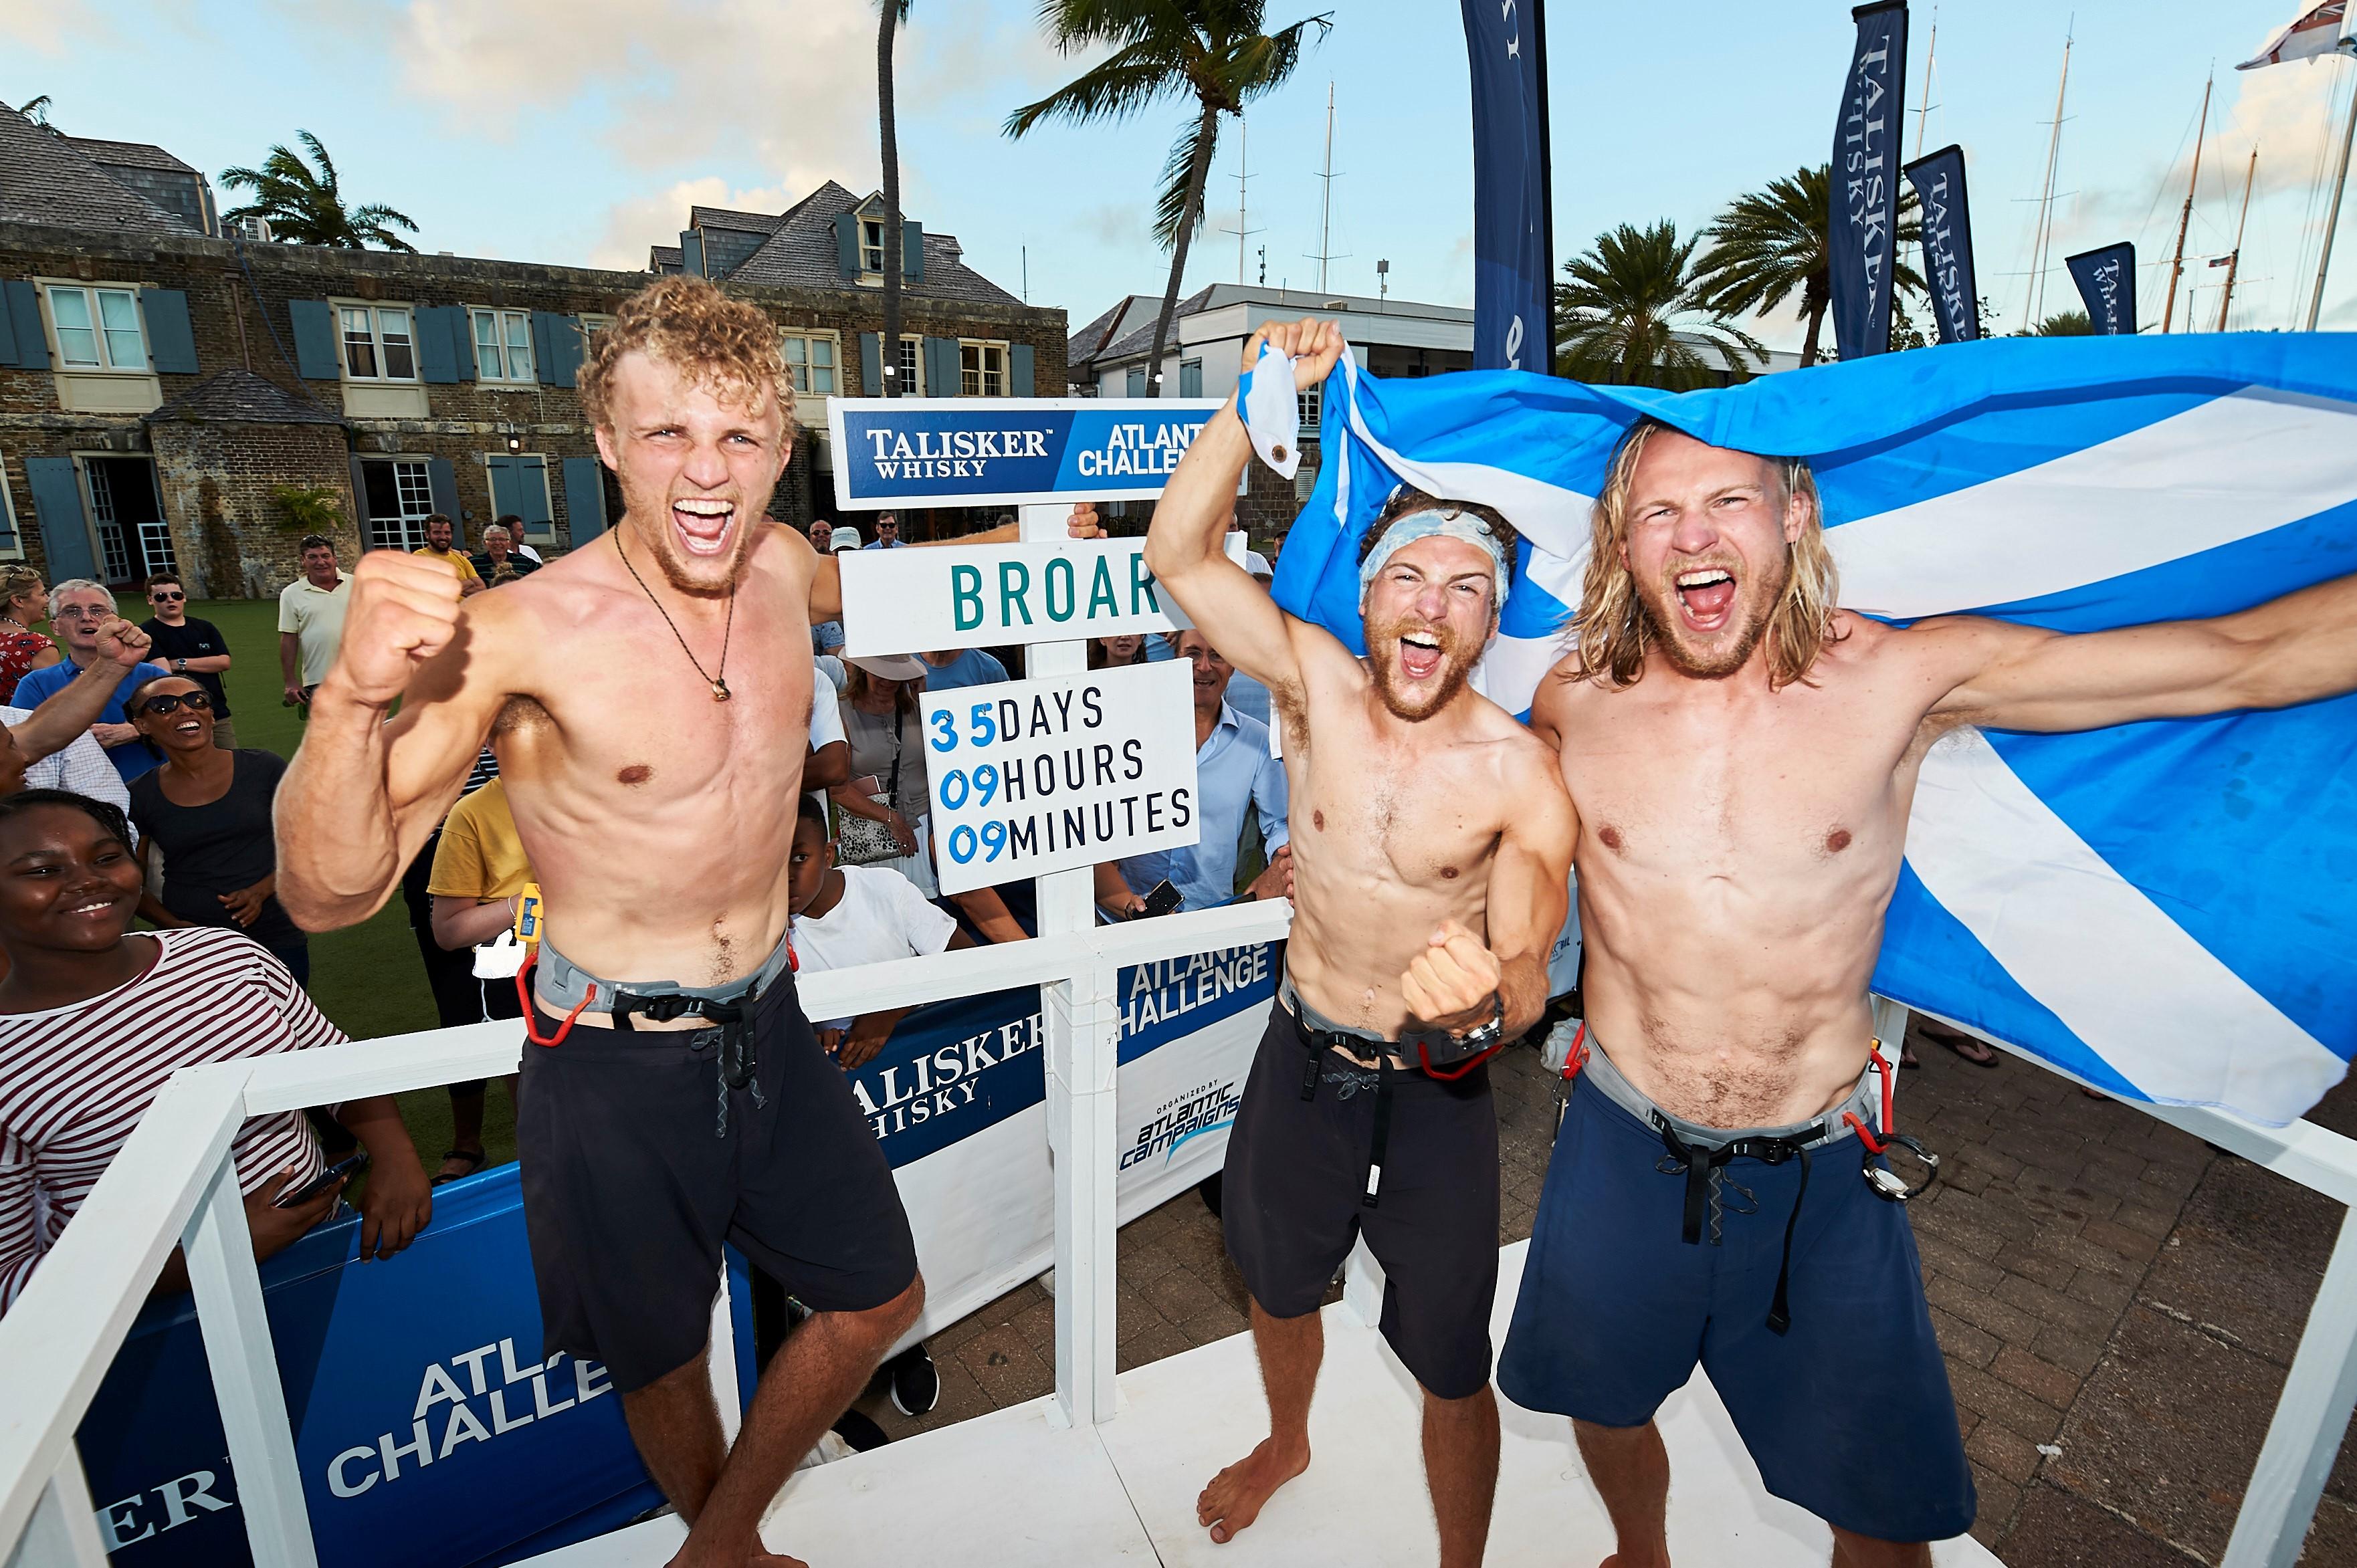 row Atlantic Scotland brothers Broar Lachlan MacLean schools